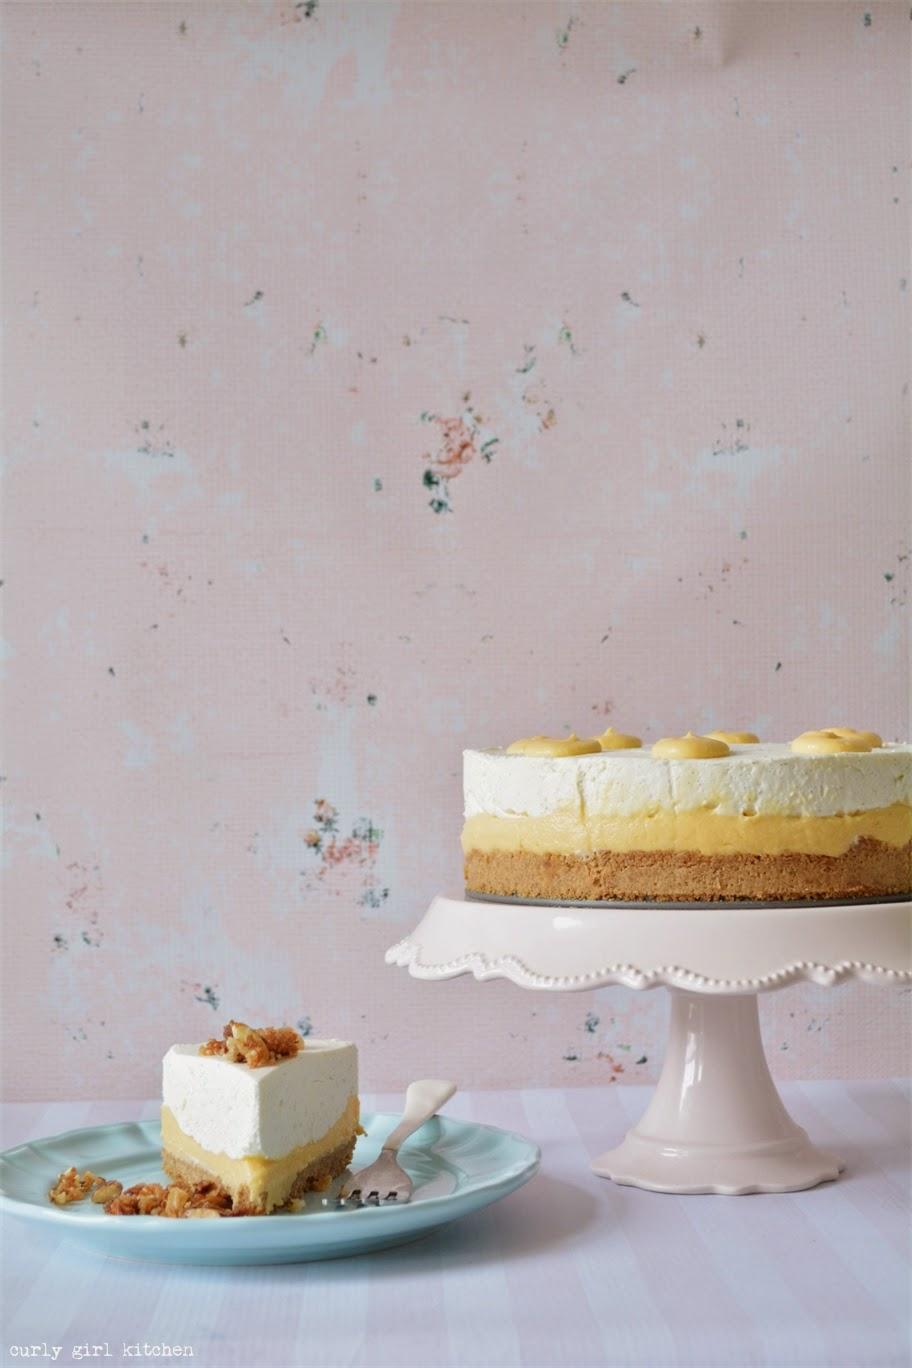 Curly Girl Kitchen: Vanilla Bean Cheesecake with Mango ...